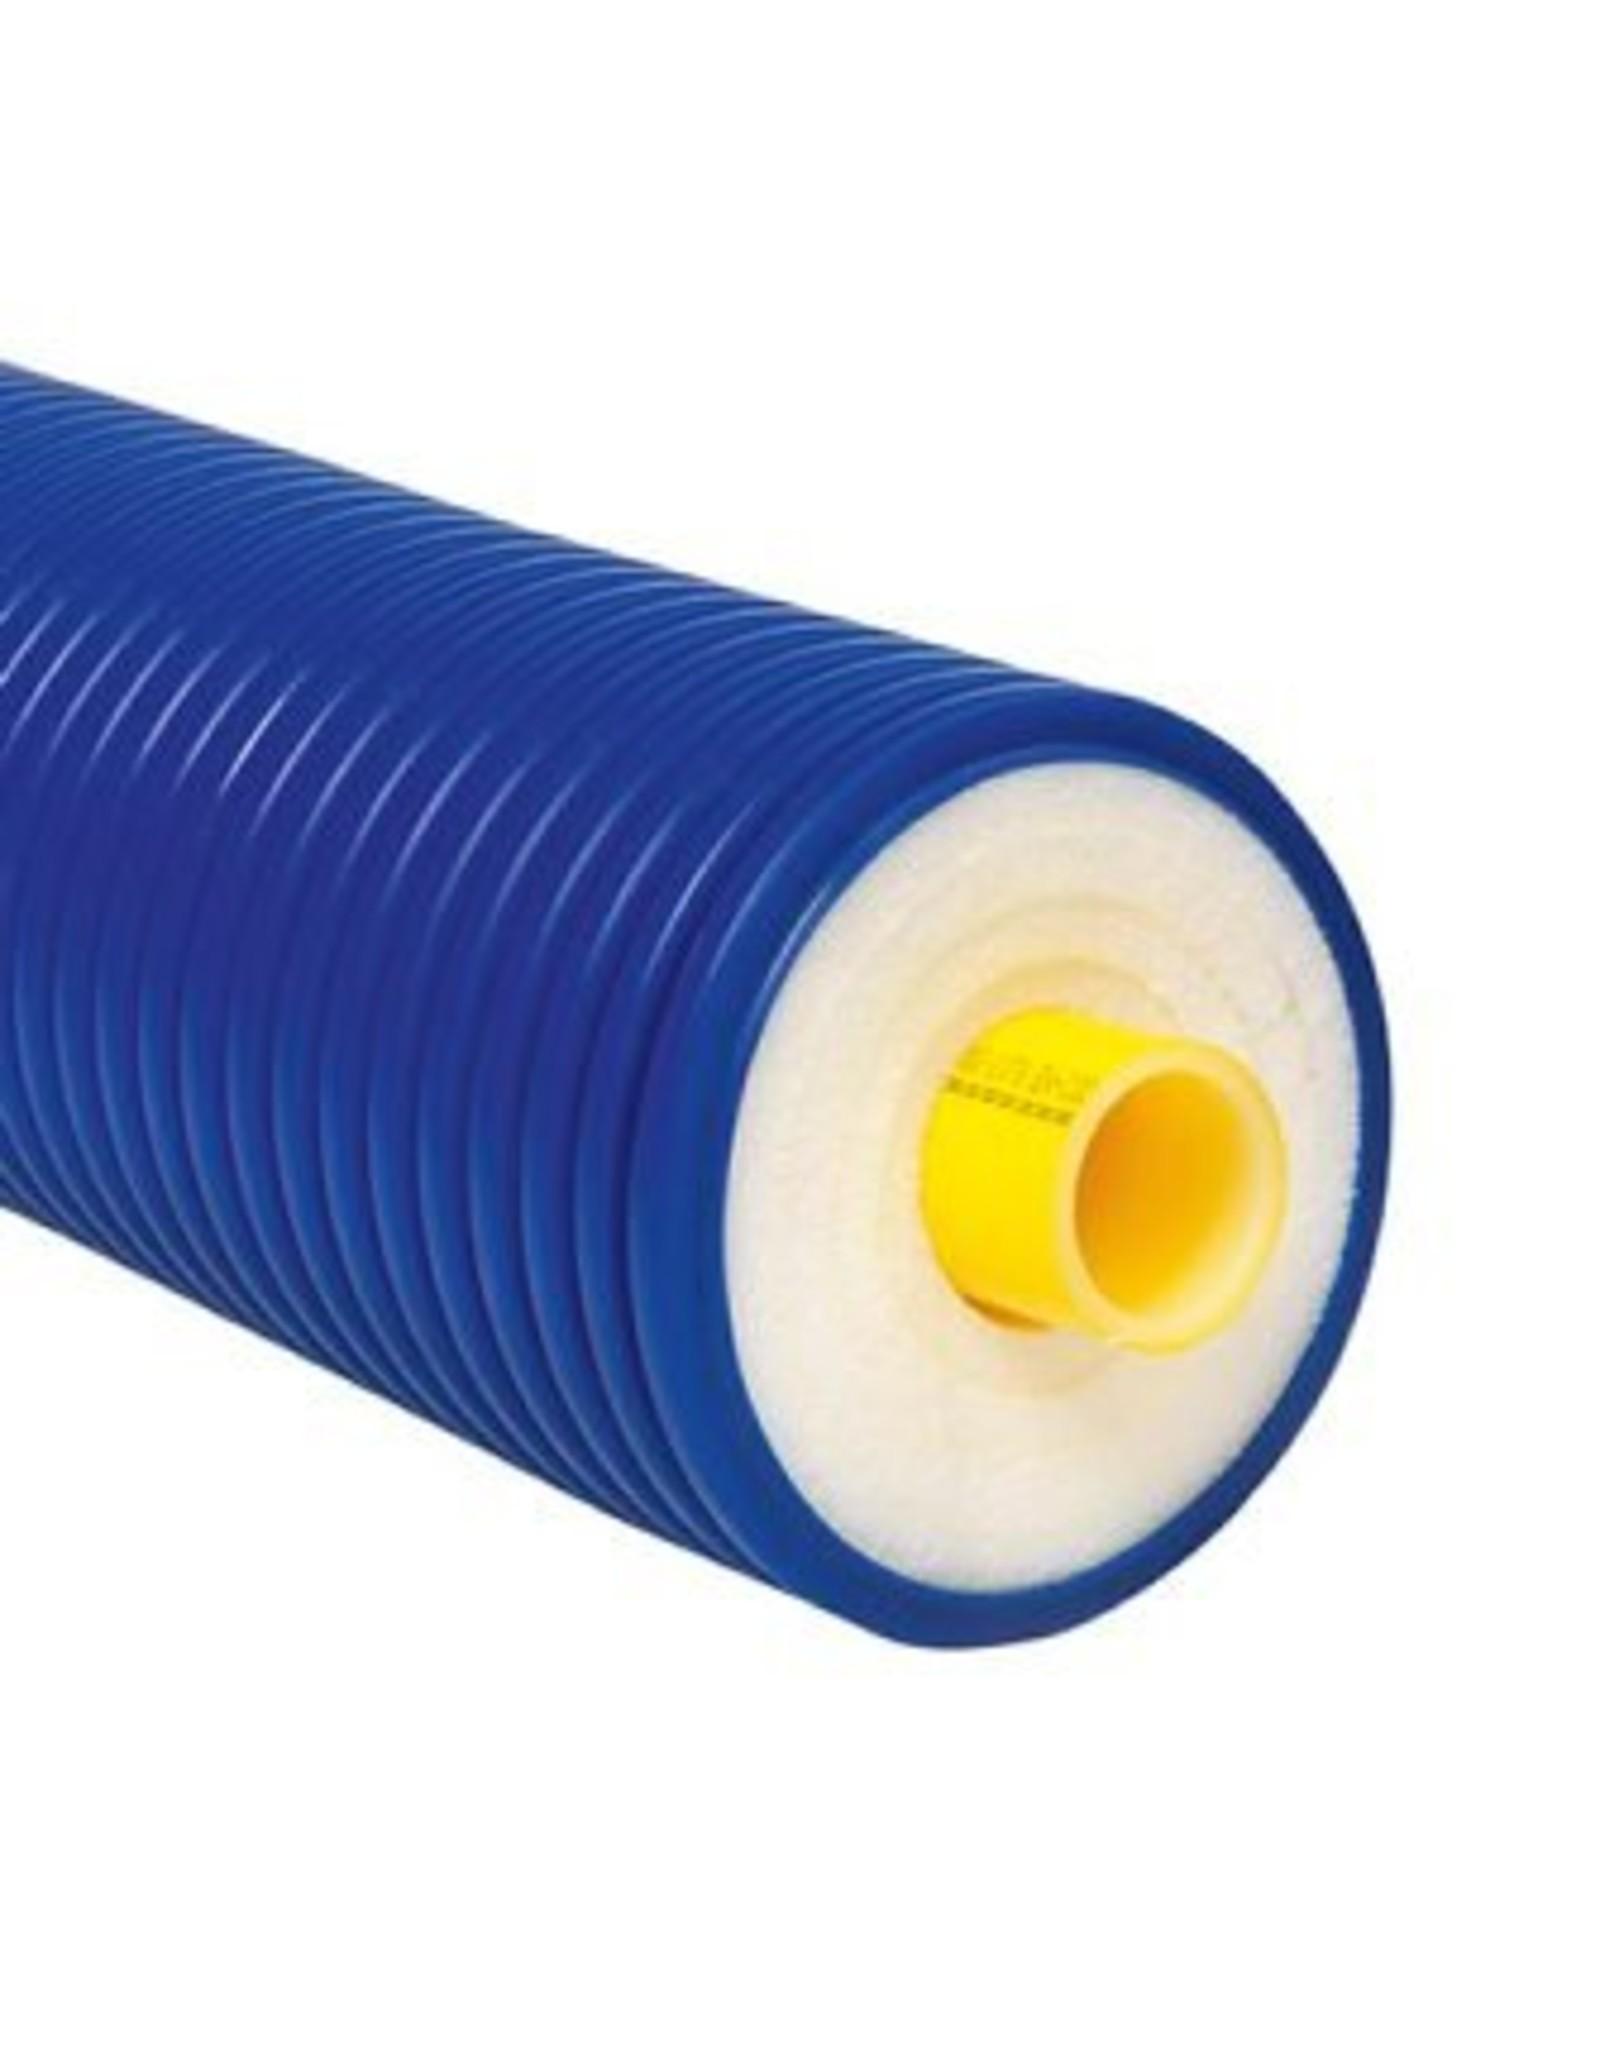 Microflex Uno 110 x 10mm prijs per meter